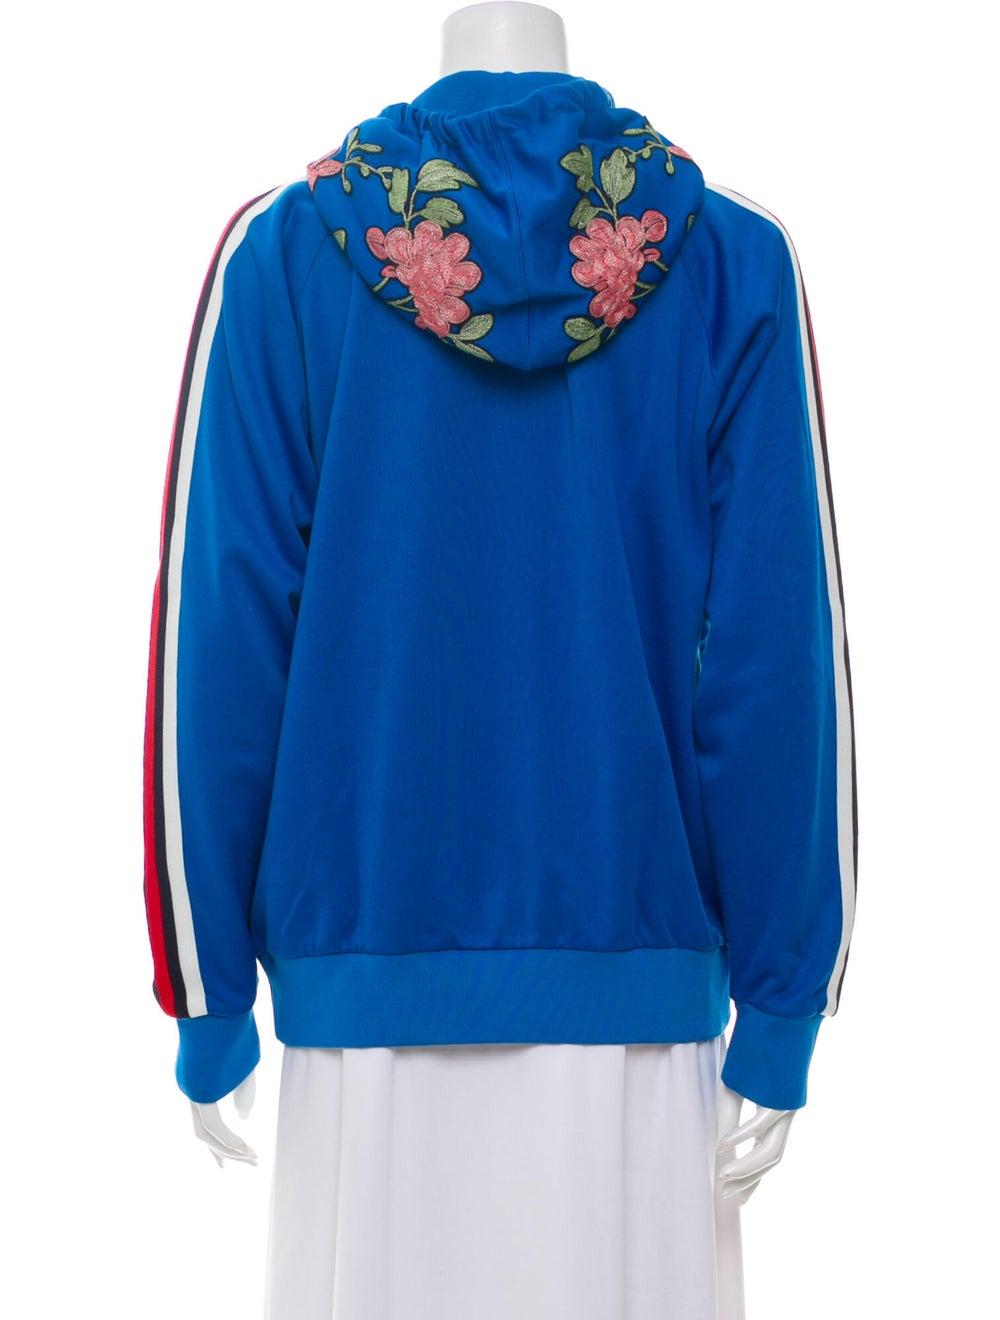 Gucci 2017 Floral Print Sweatshirt Blue - image 3